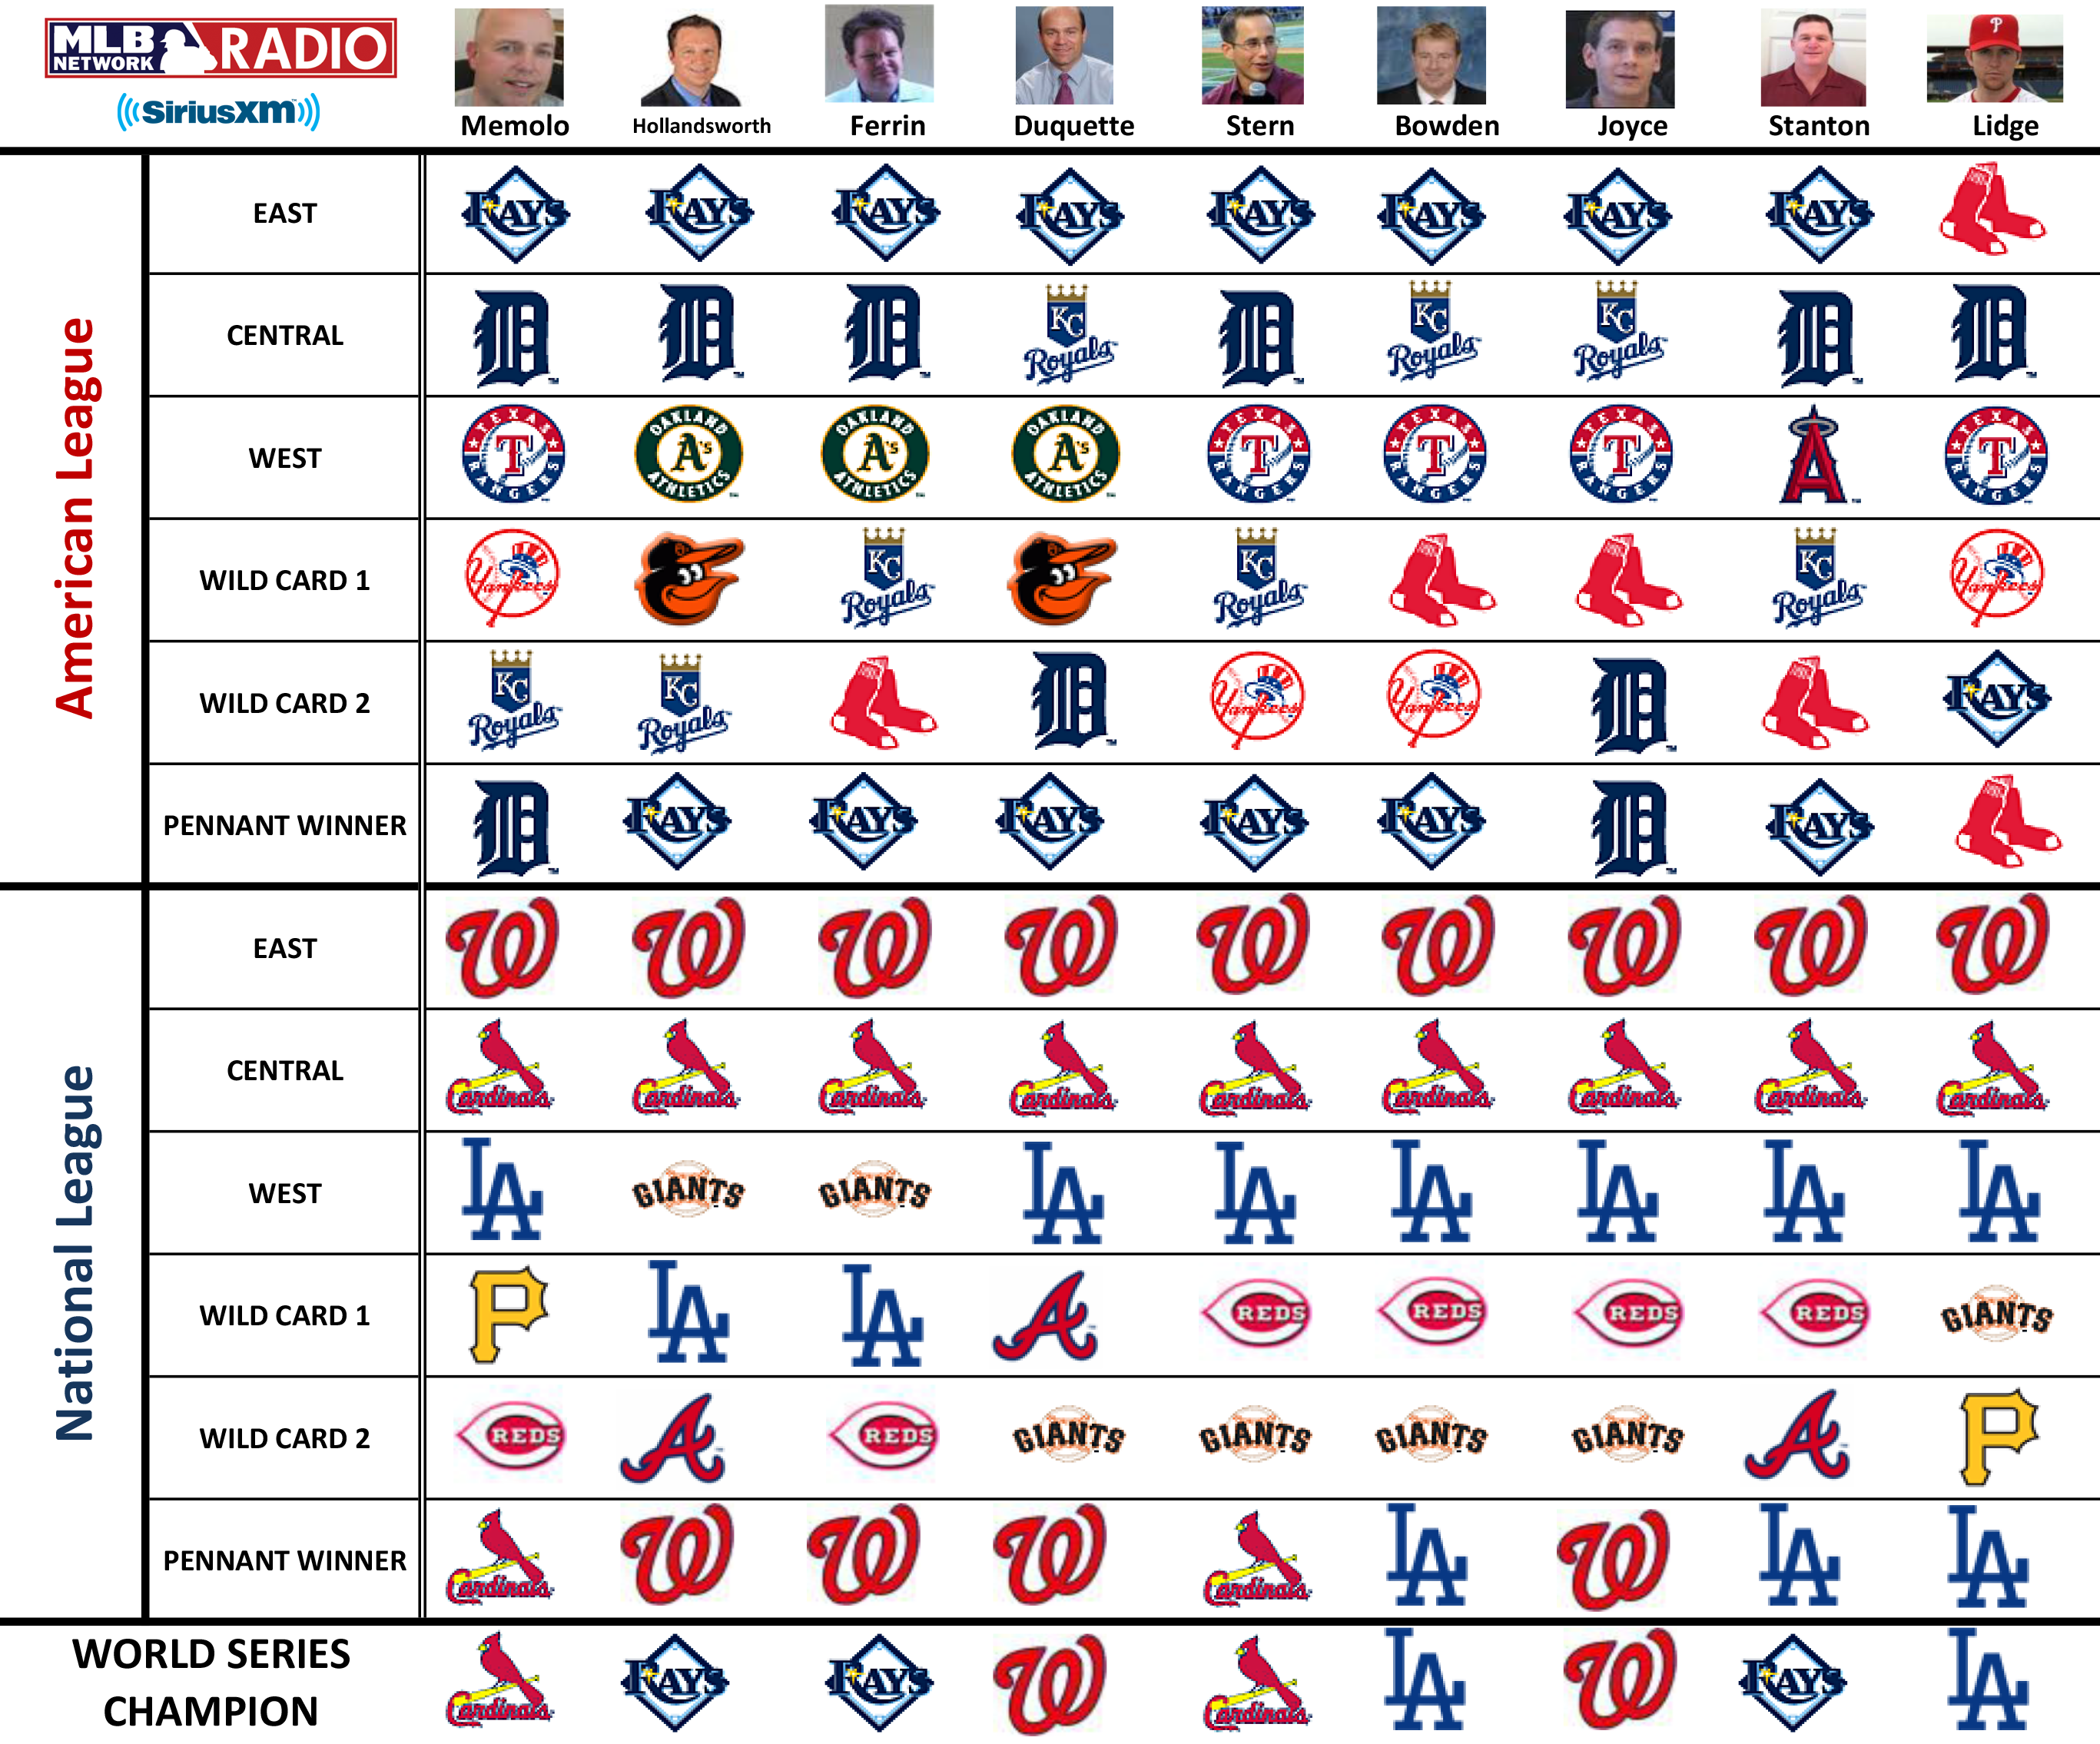 MLB Network Radio's 2014 season predictions  